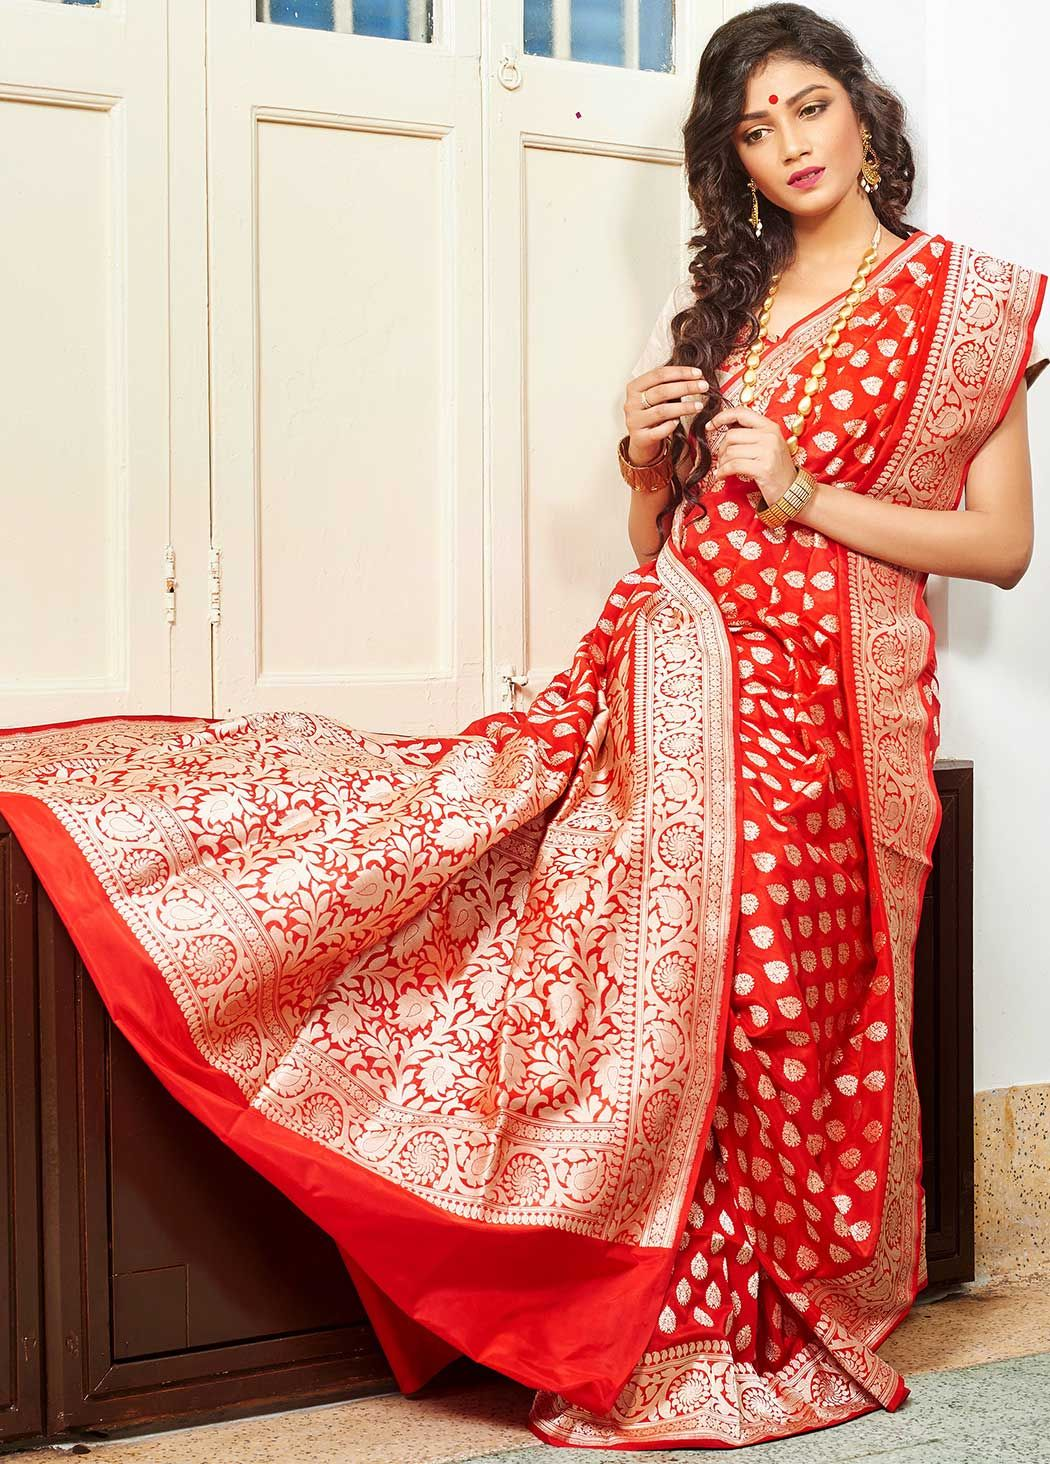 6d246dcbad RED BENARASI SAREE WITH BLOUSE | ISHA | Things to Wear(Sarees) in ...